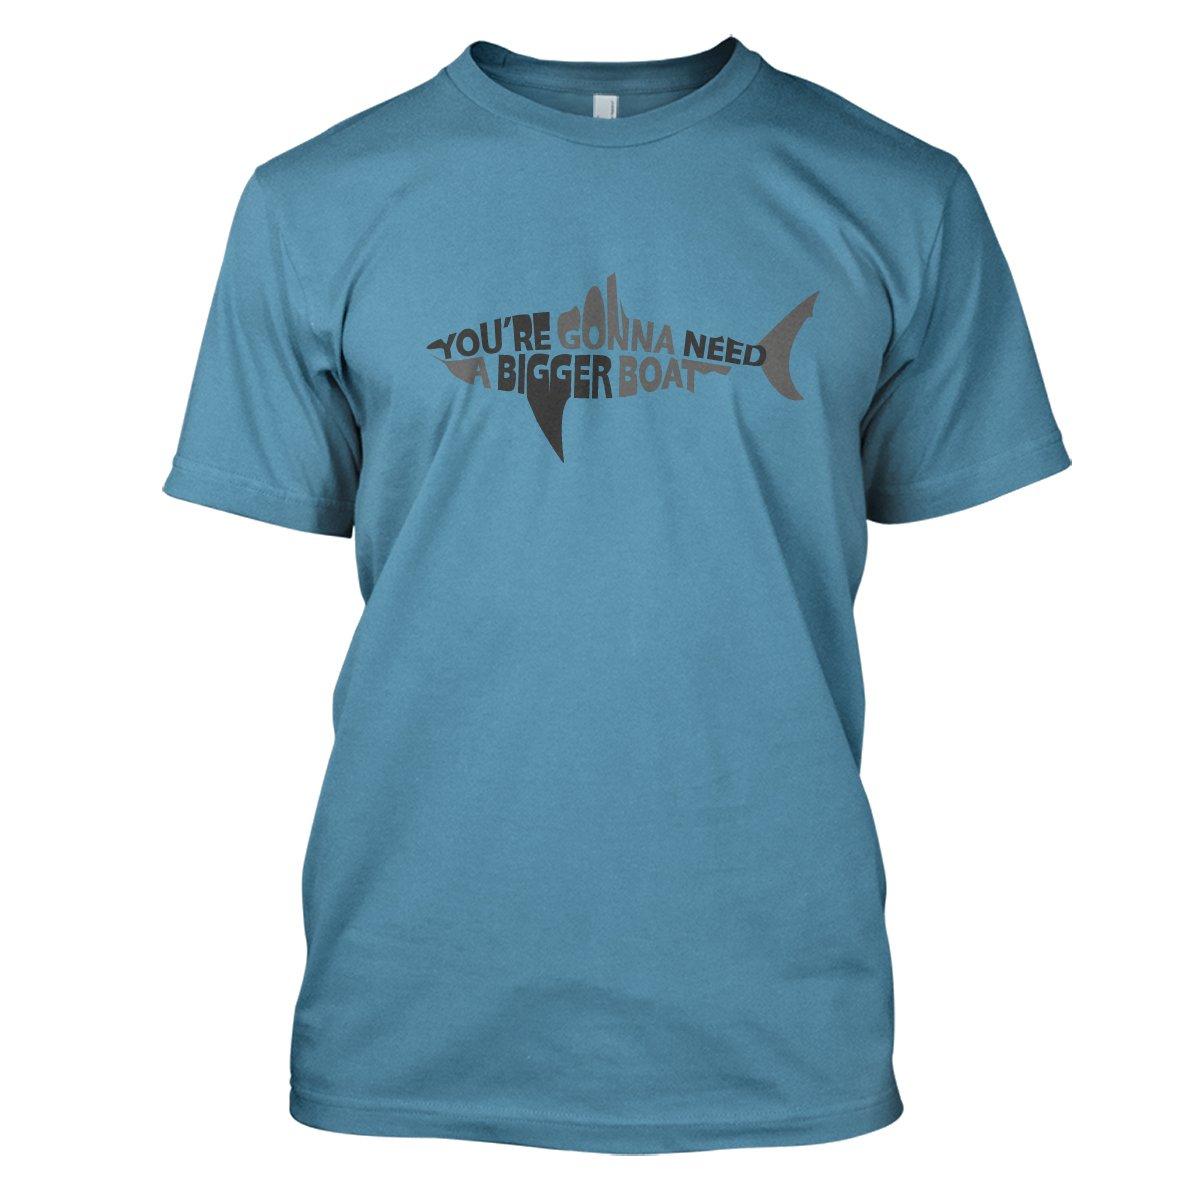 Jaws: Bigger Boat Mens Movie T-Shirt Large Sky